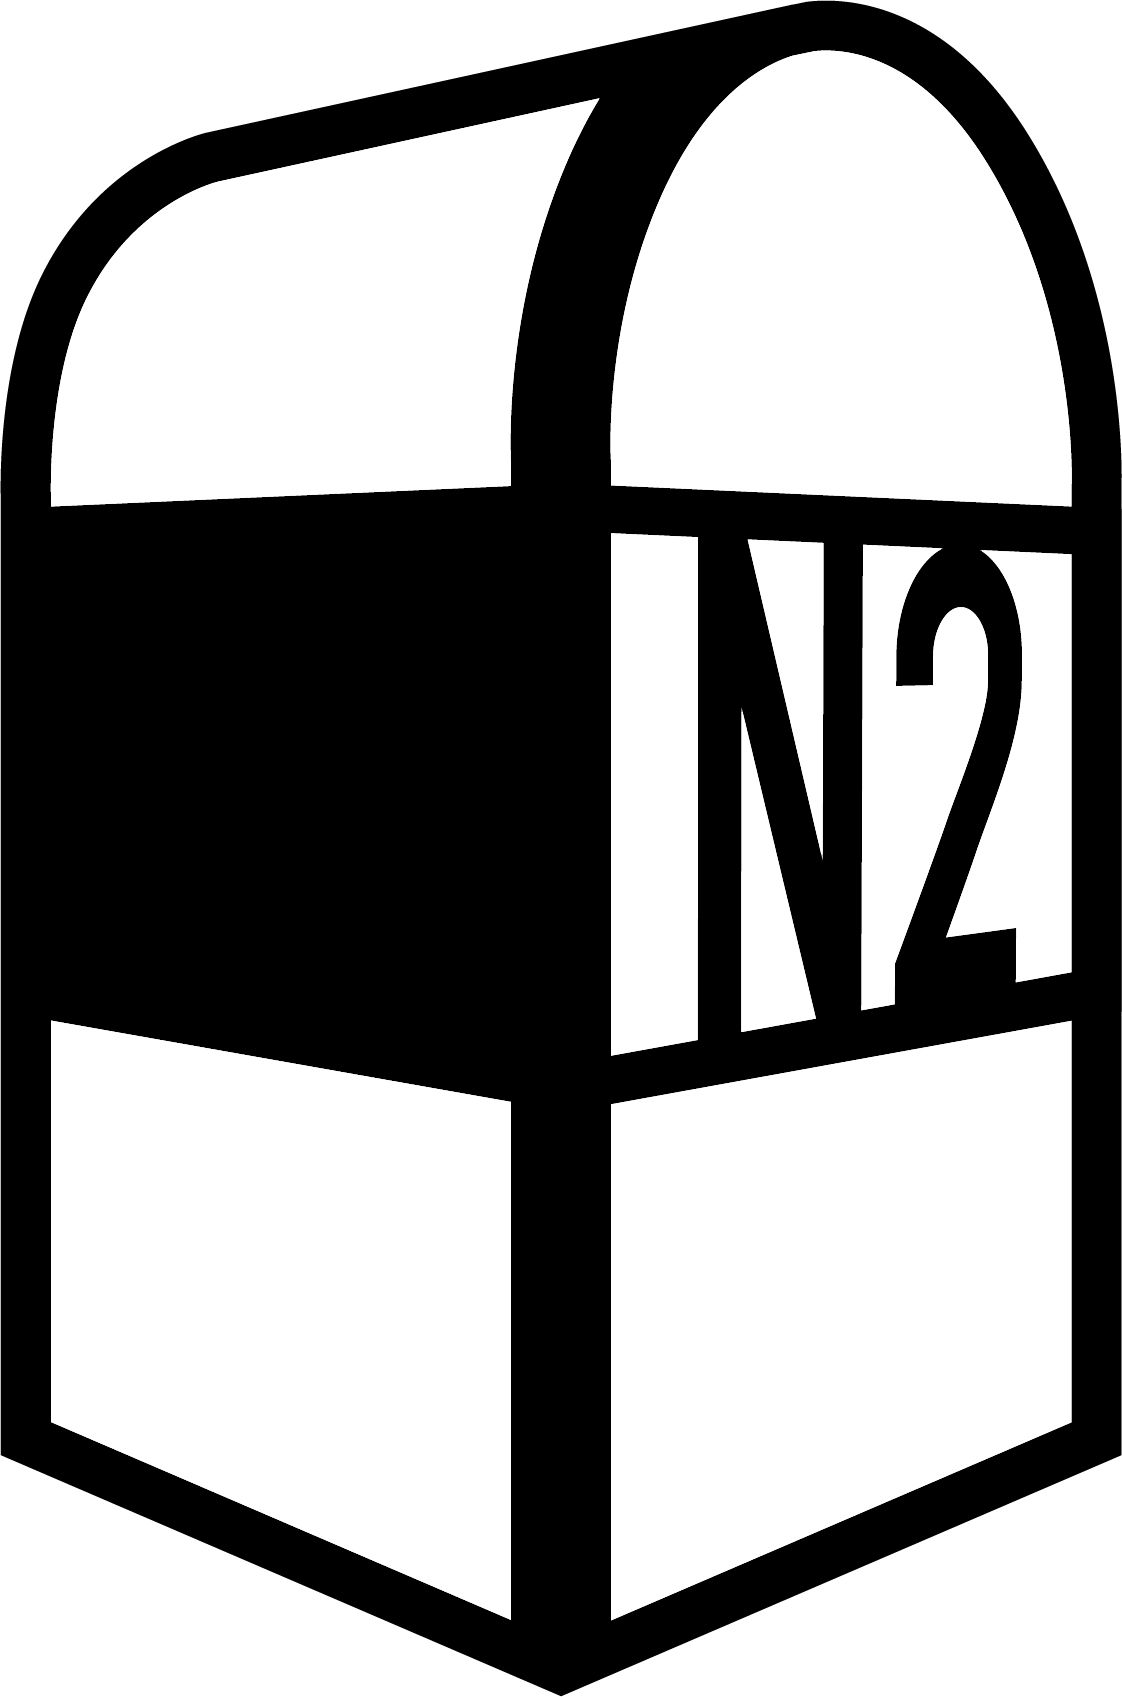 Estrada Nacional 2 Logotipo